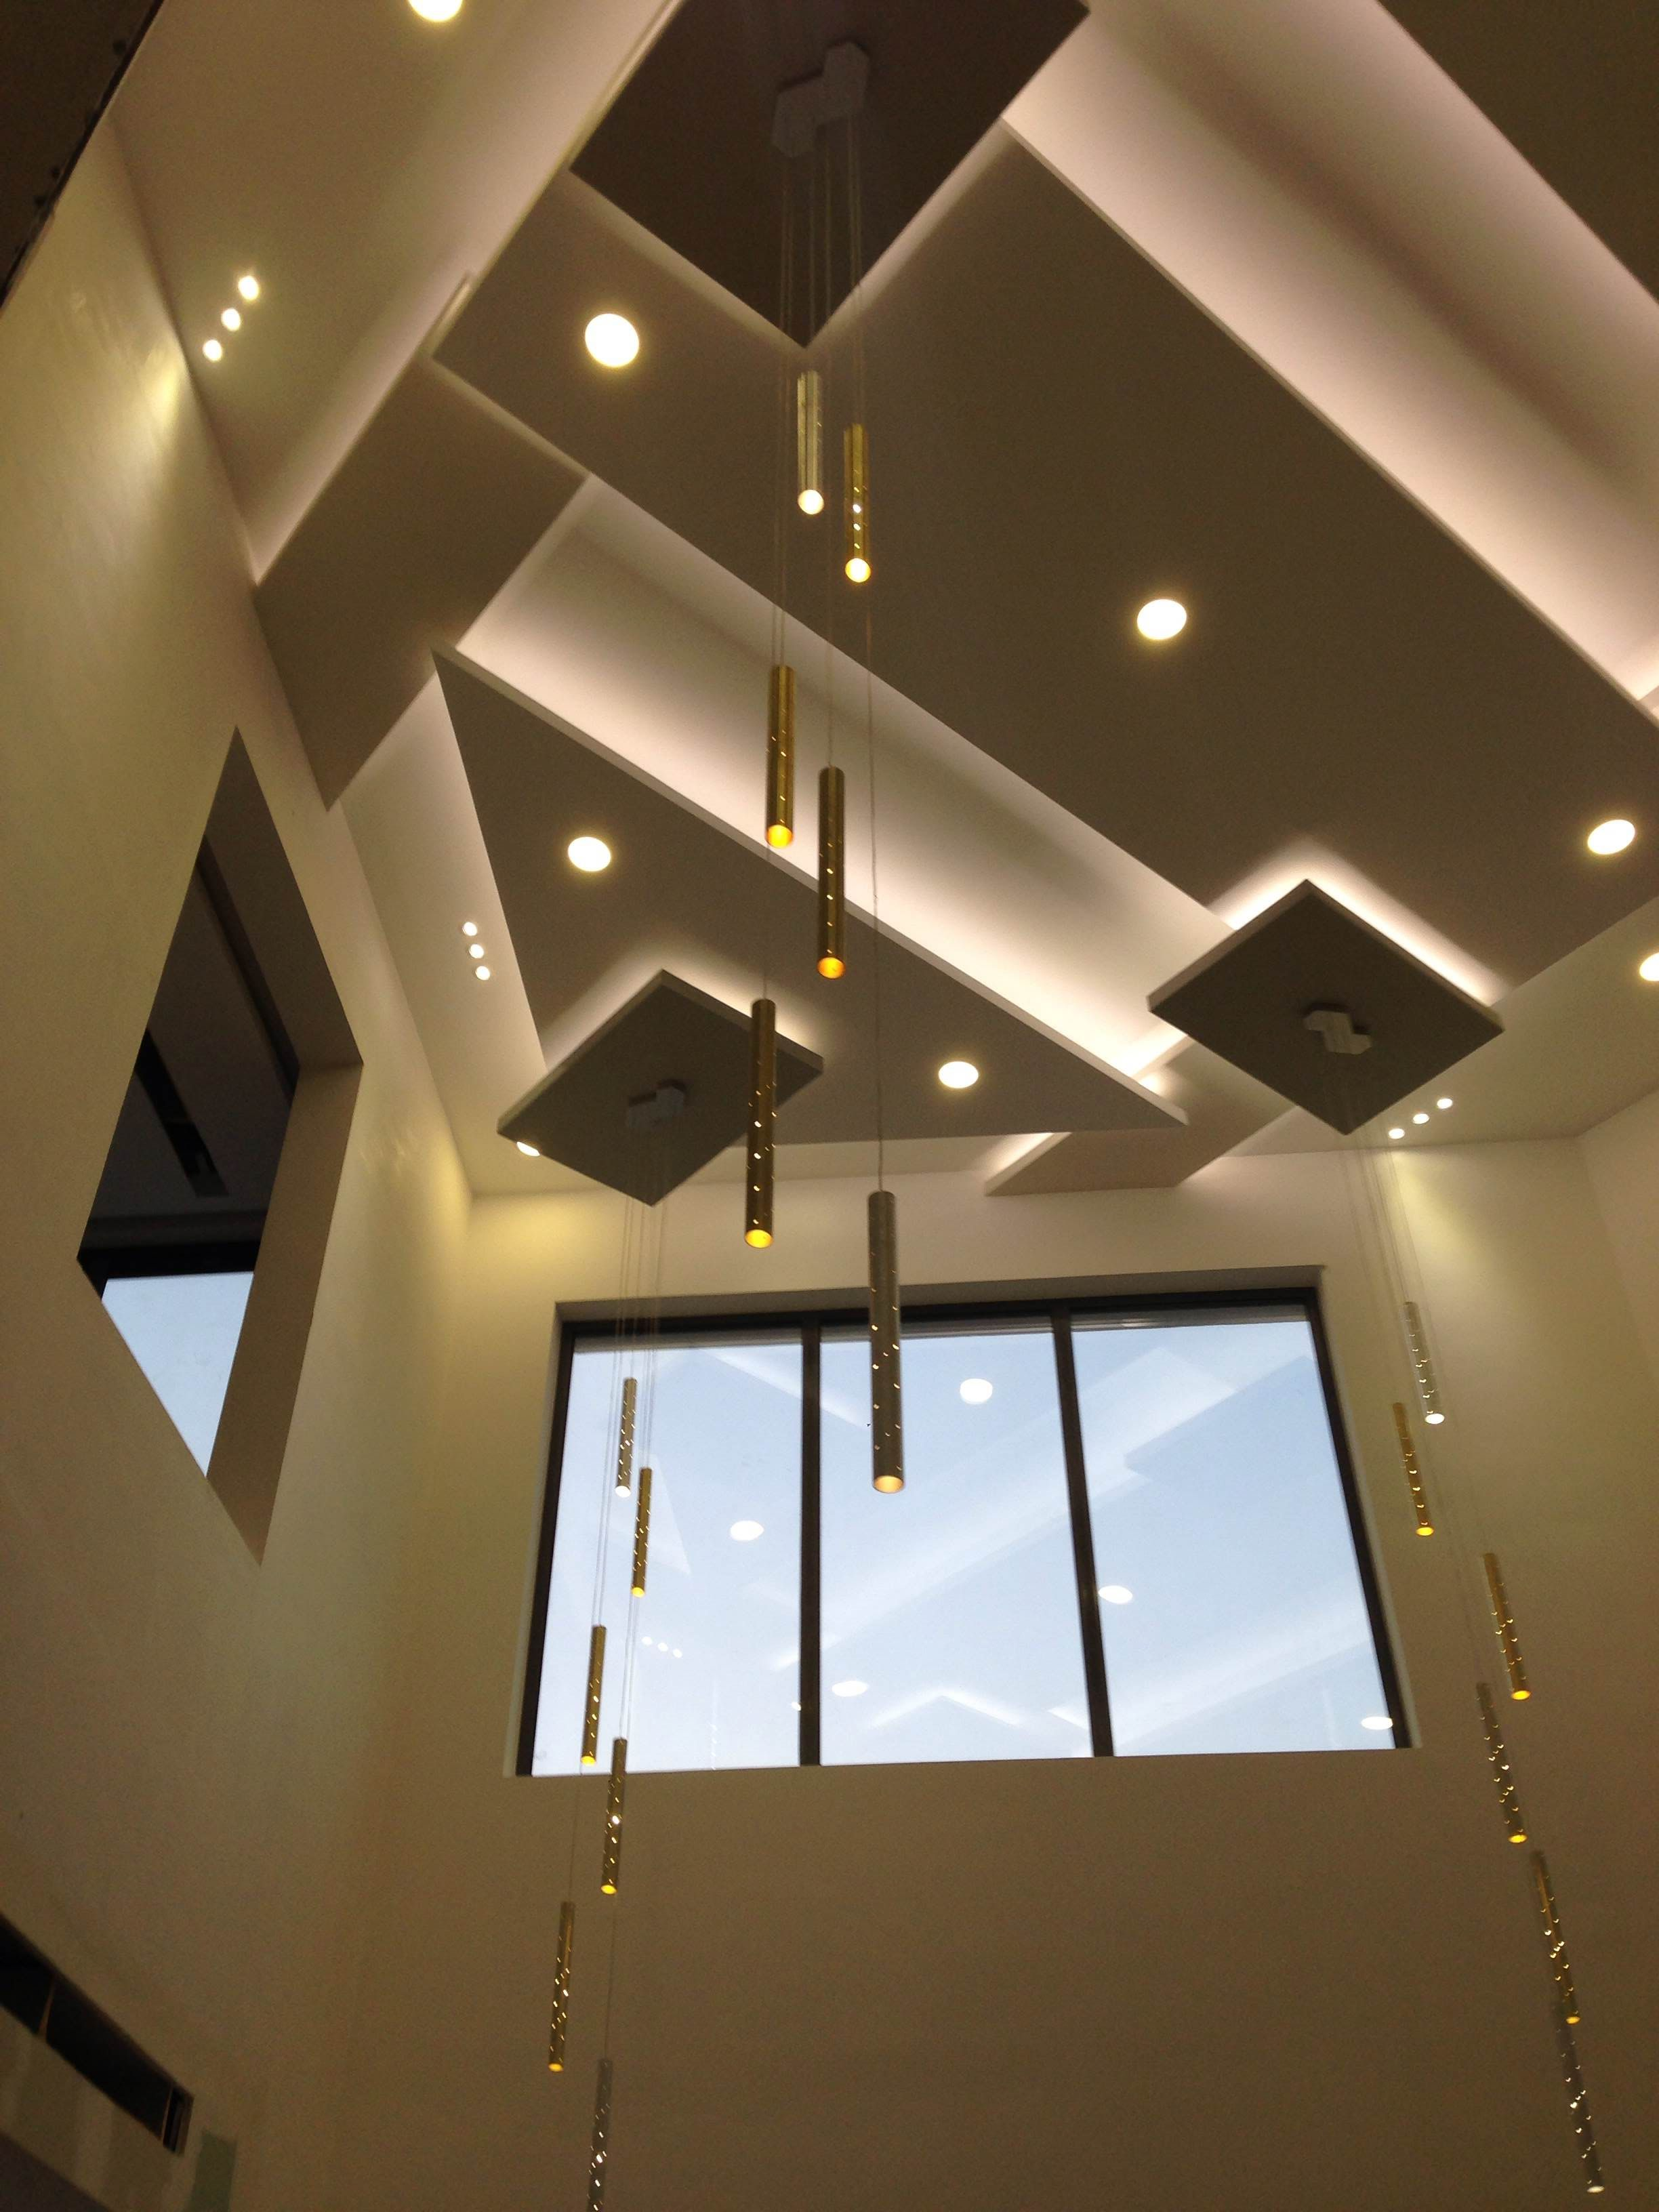 Heavy Rain Light Drops Muscat Oman Ceiling Design Bedroom | Staircase False Ceiling Design | Hallway | Office | Duplex | Veneer Design | Simple